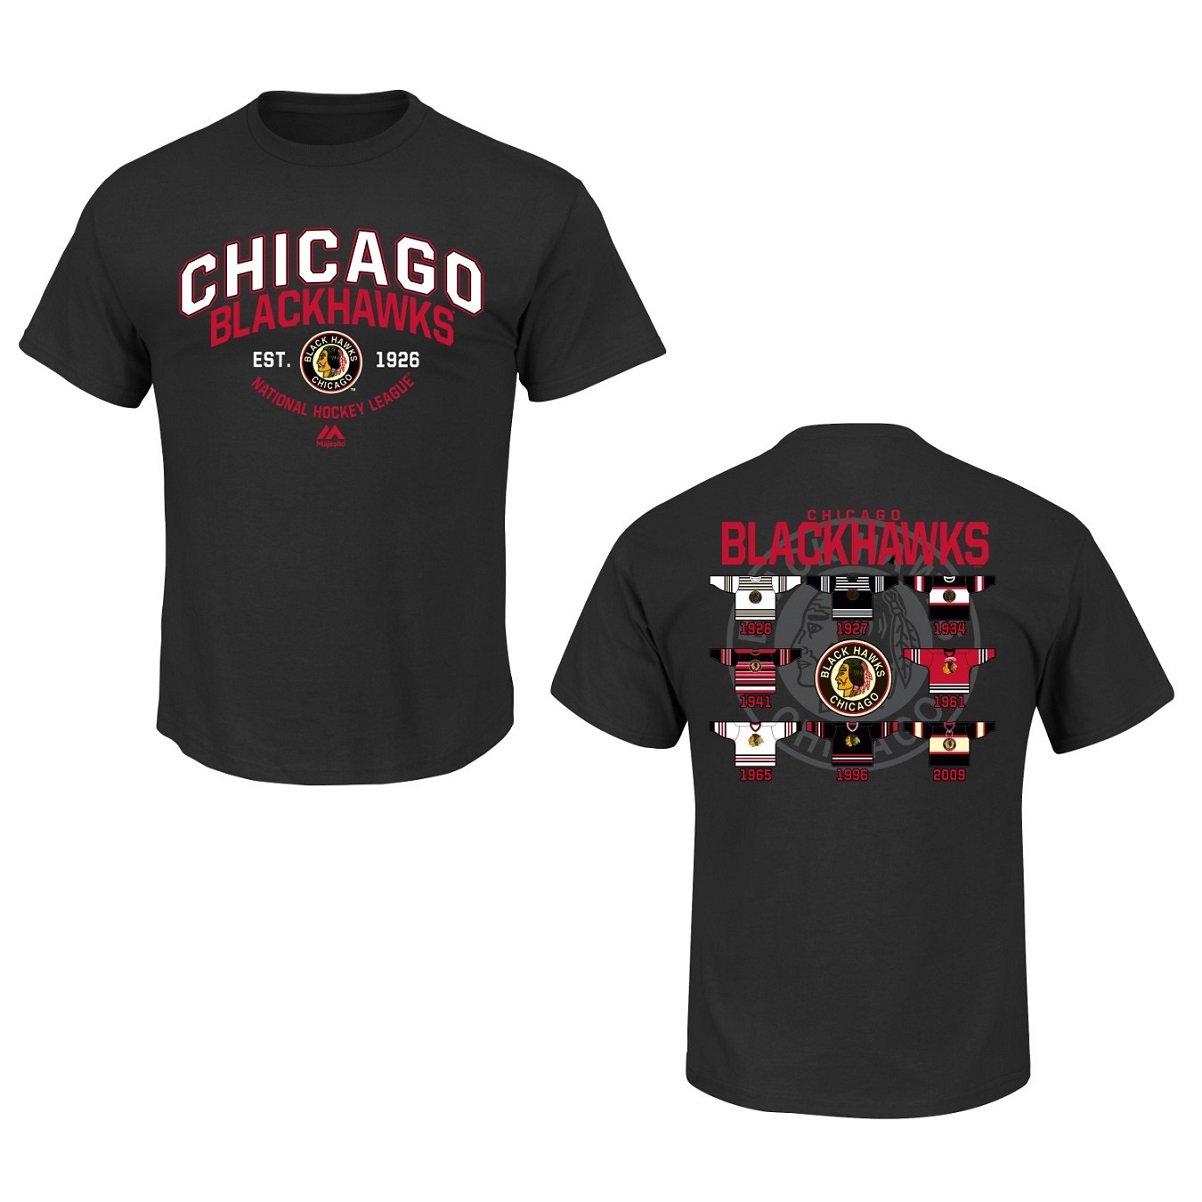 c04c4002c Amazon.com   Majestic Chicago Blackhawks Black Vintage Jersey History T- Shirt   Sports   Outdoors